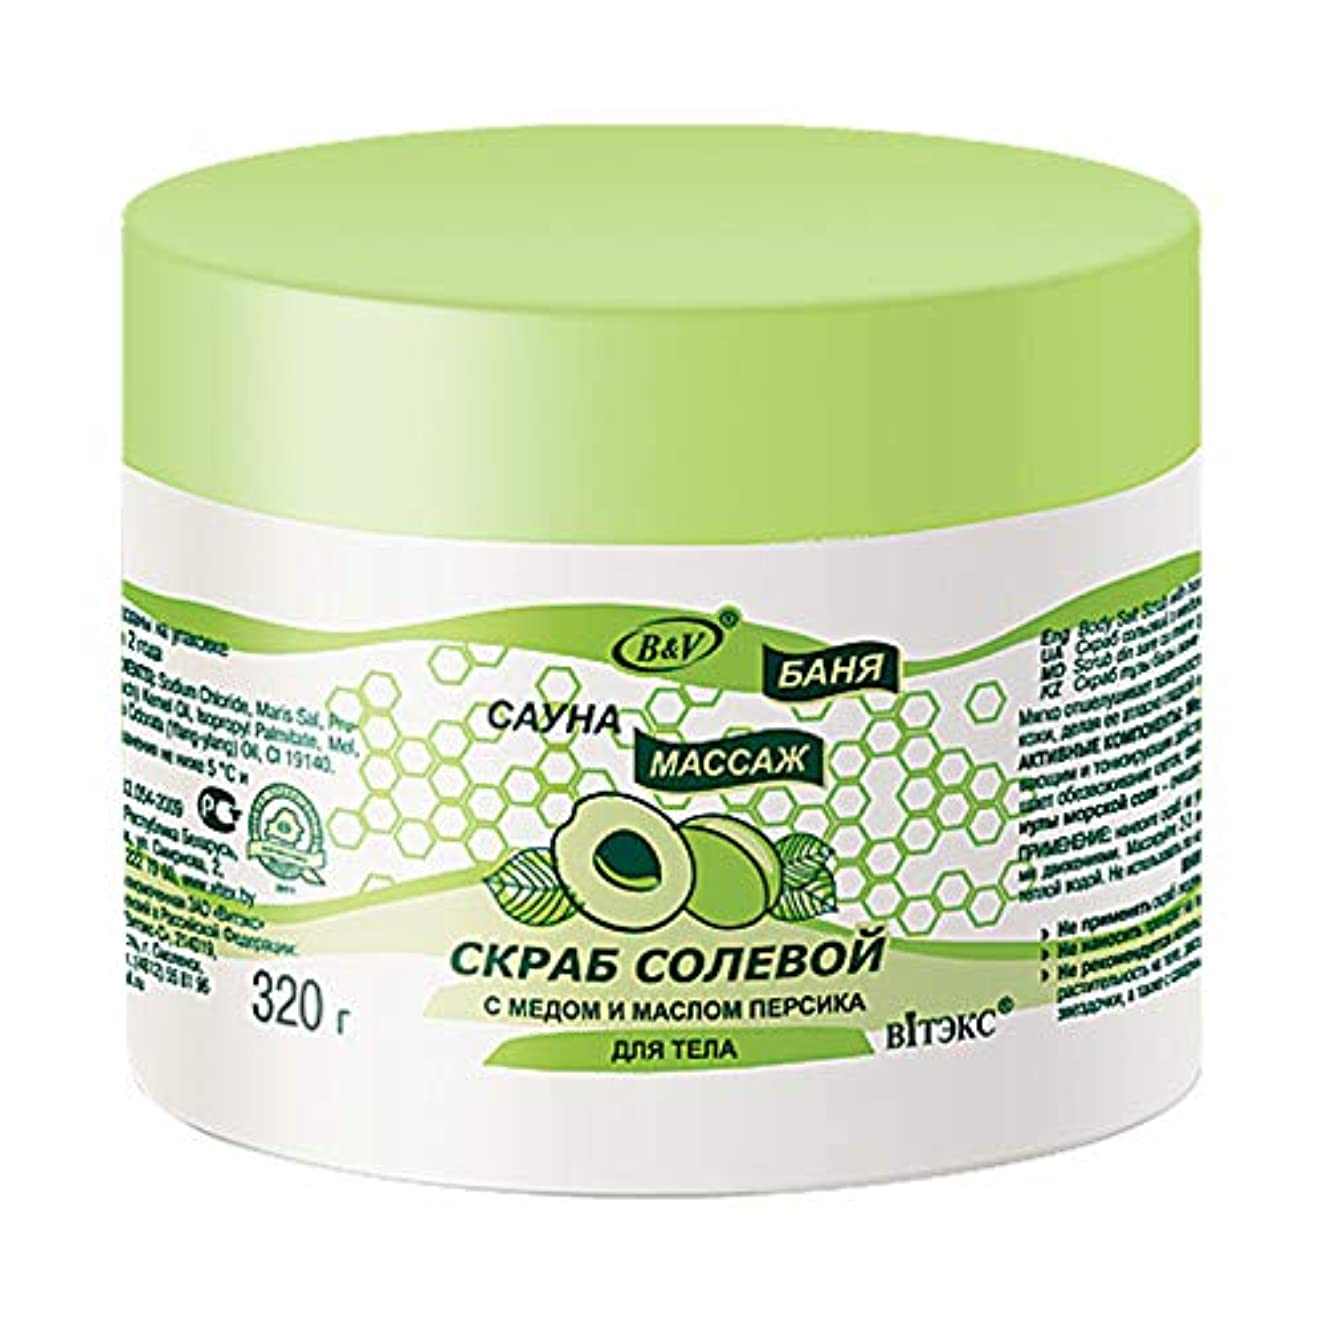 痛み虹失態Bielita & Vitex | Bath Sauna Massage | Body Salt Scrub | Honey | Peach Oil | Sea Oil Granules | Vitamins | 320 ml